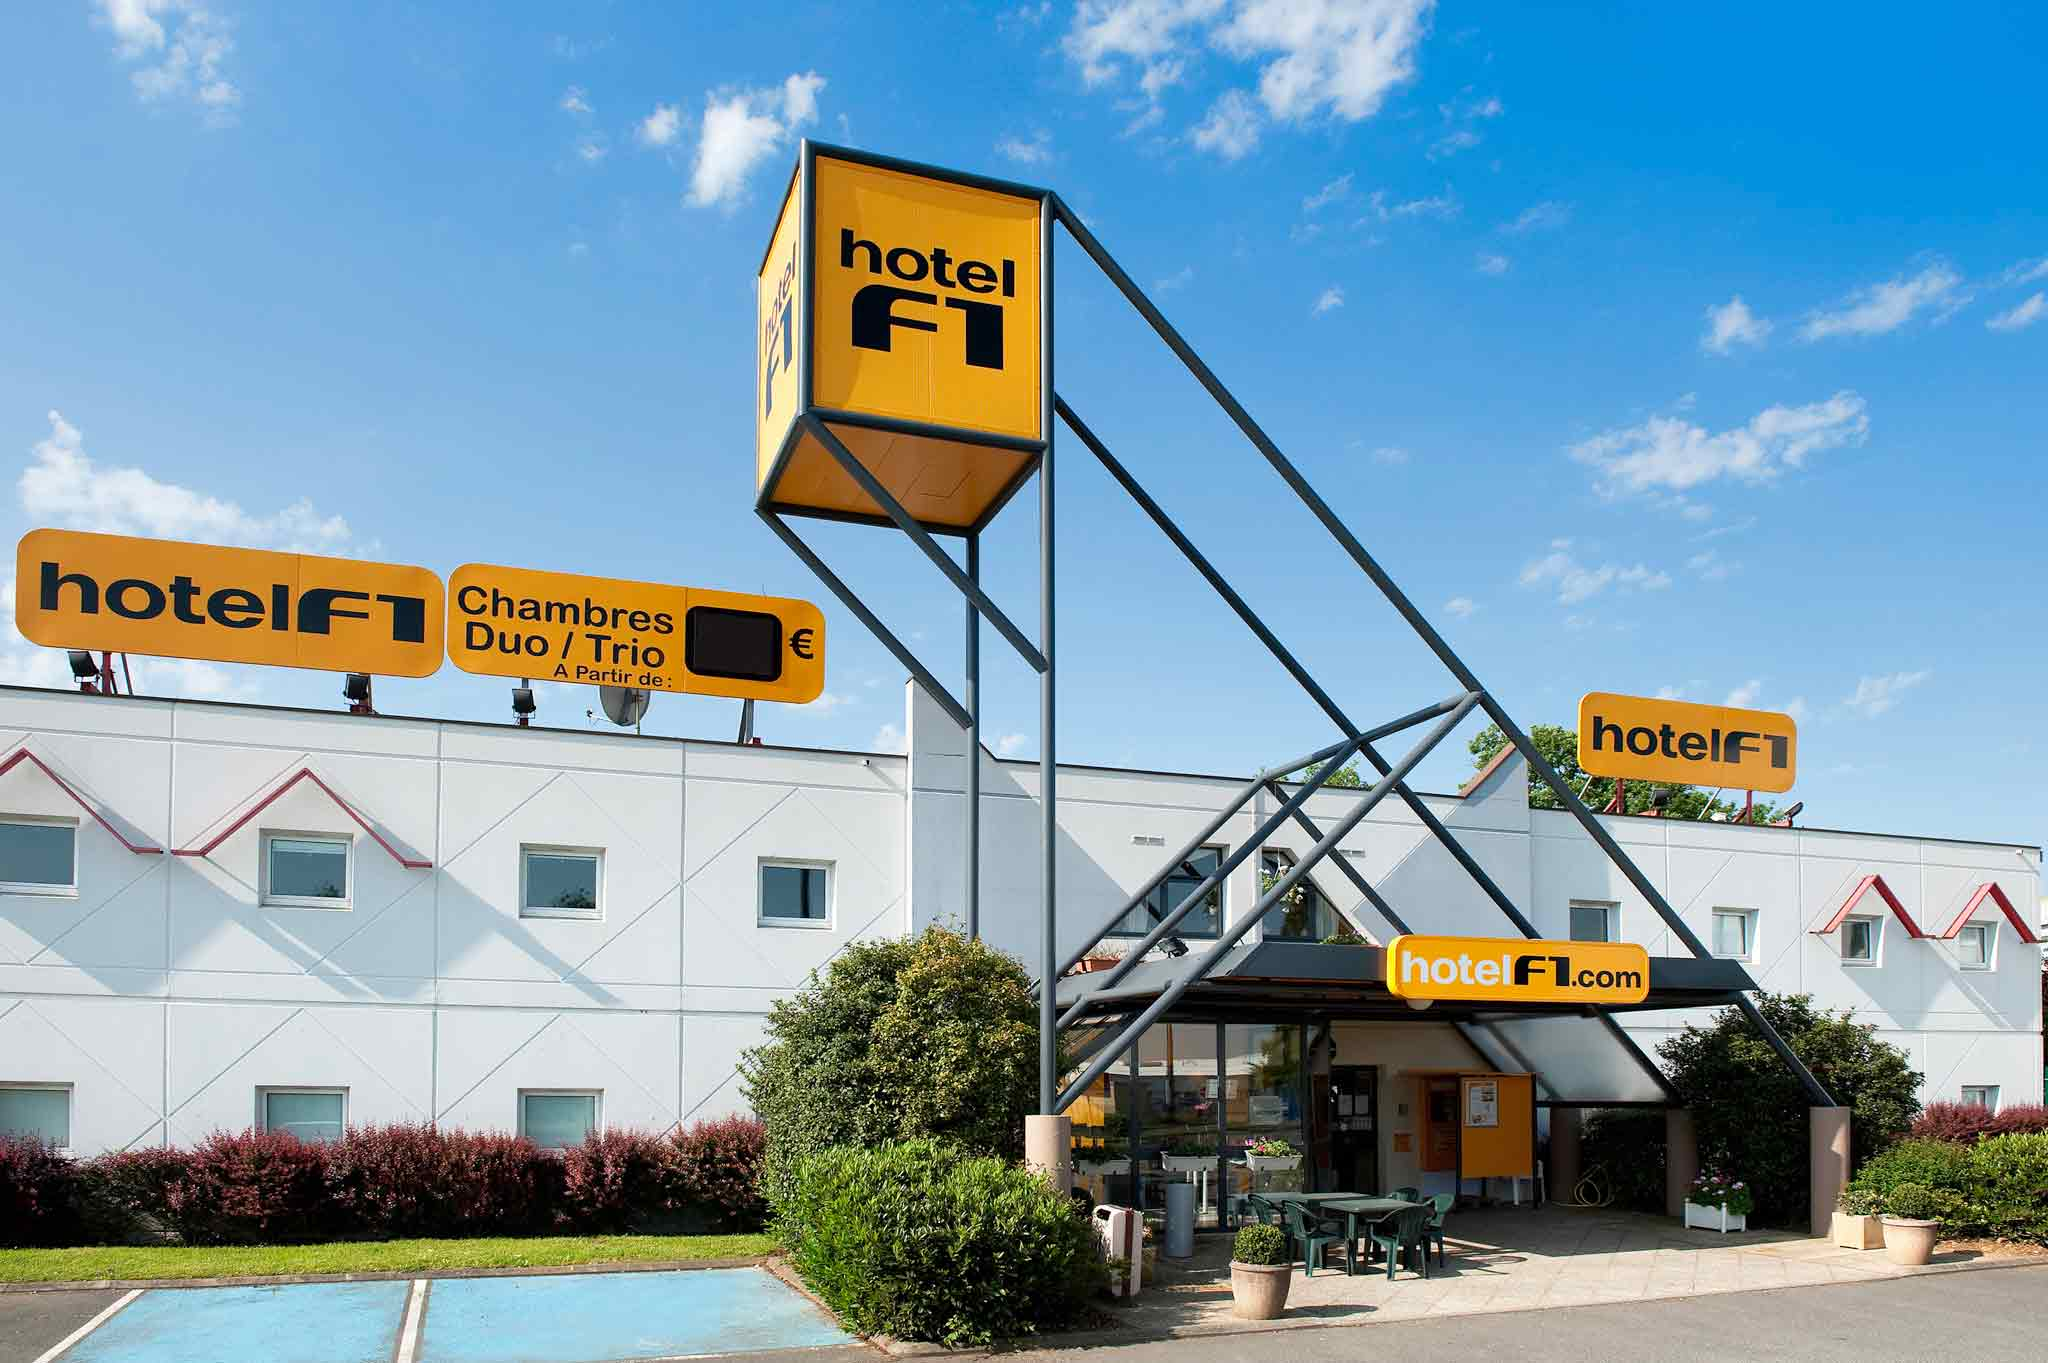 فندق - hotelF1 Brie-Comte-Robert